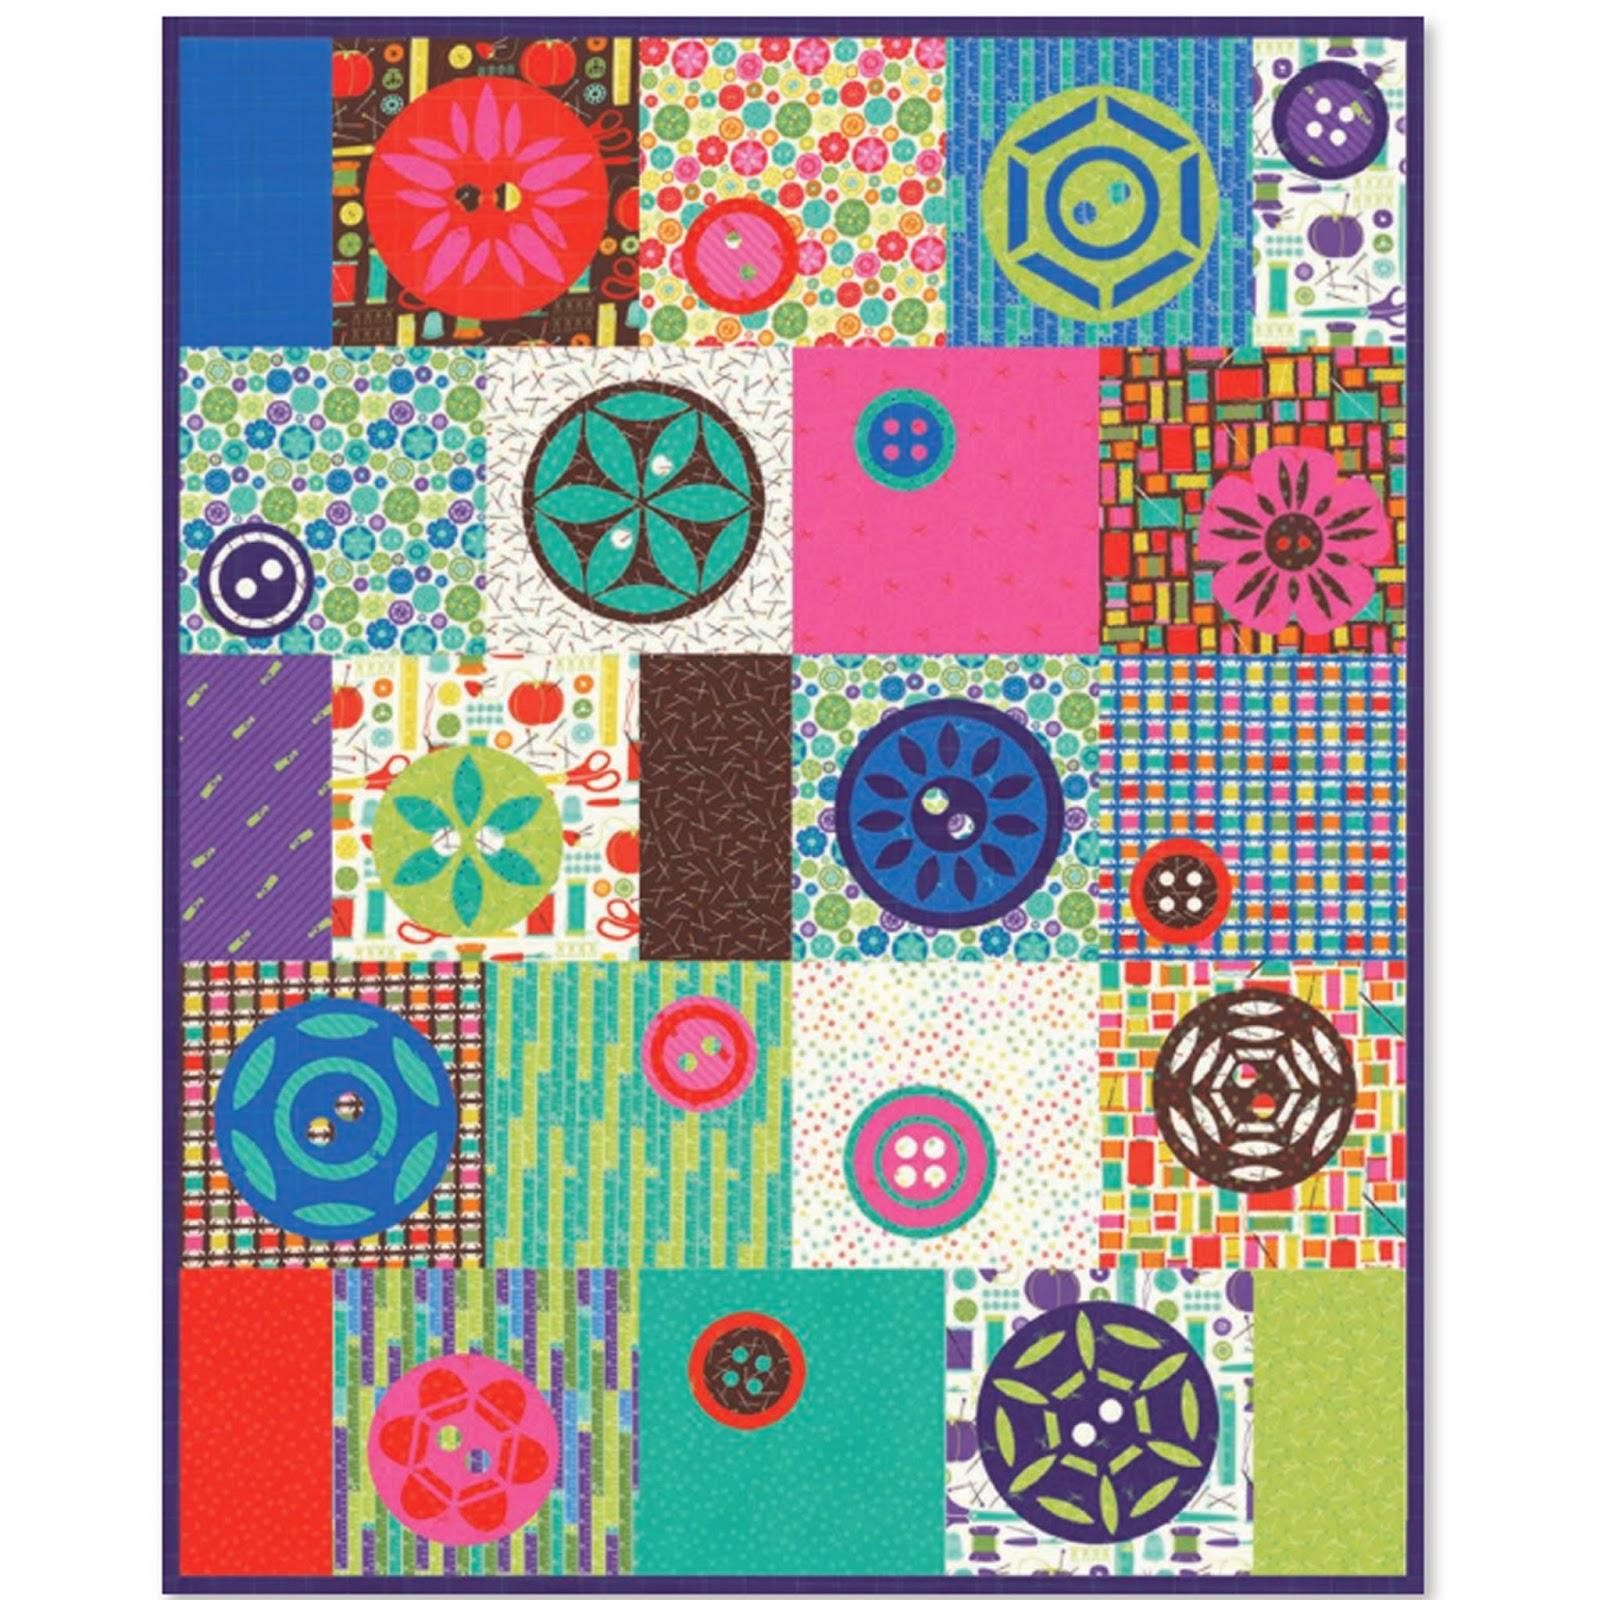 Moda SEWING BOX Free Quilt Pattern by Gina Martin